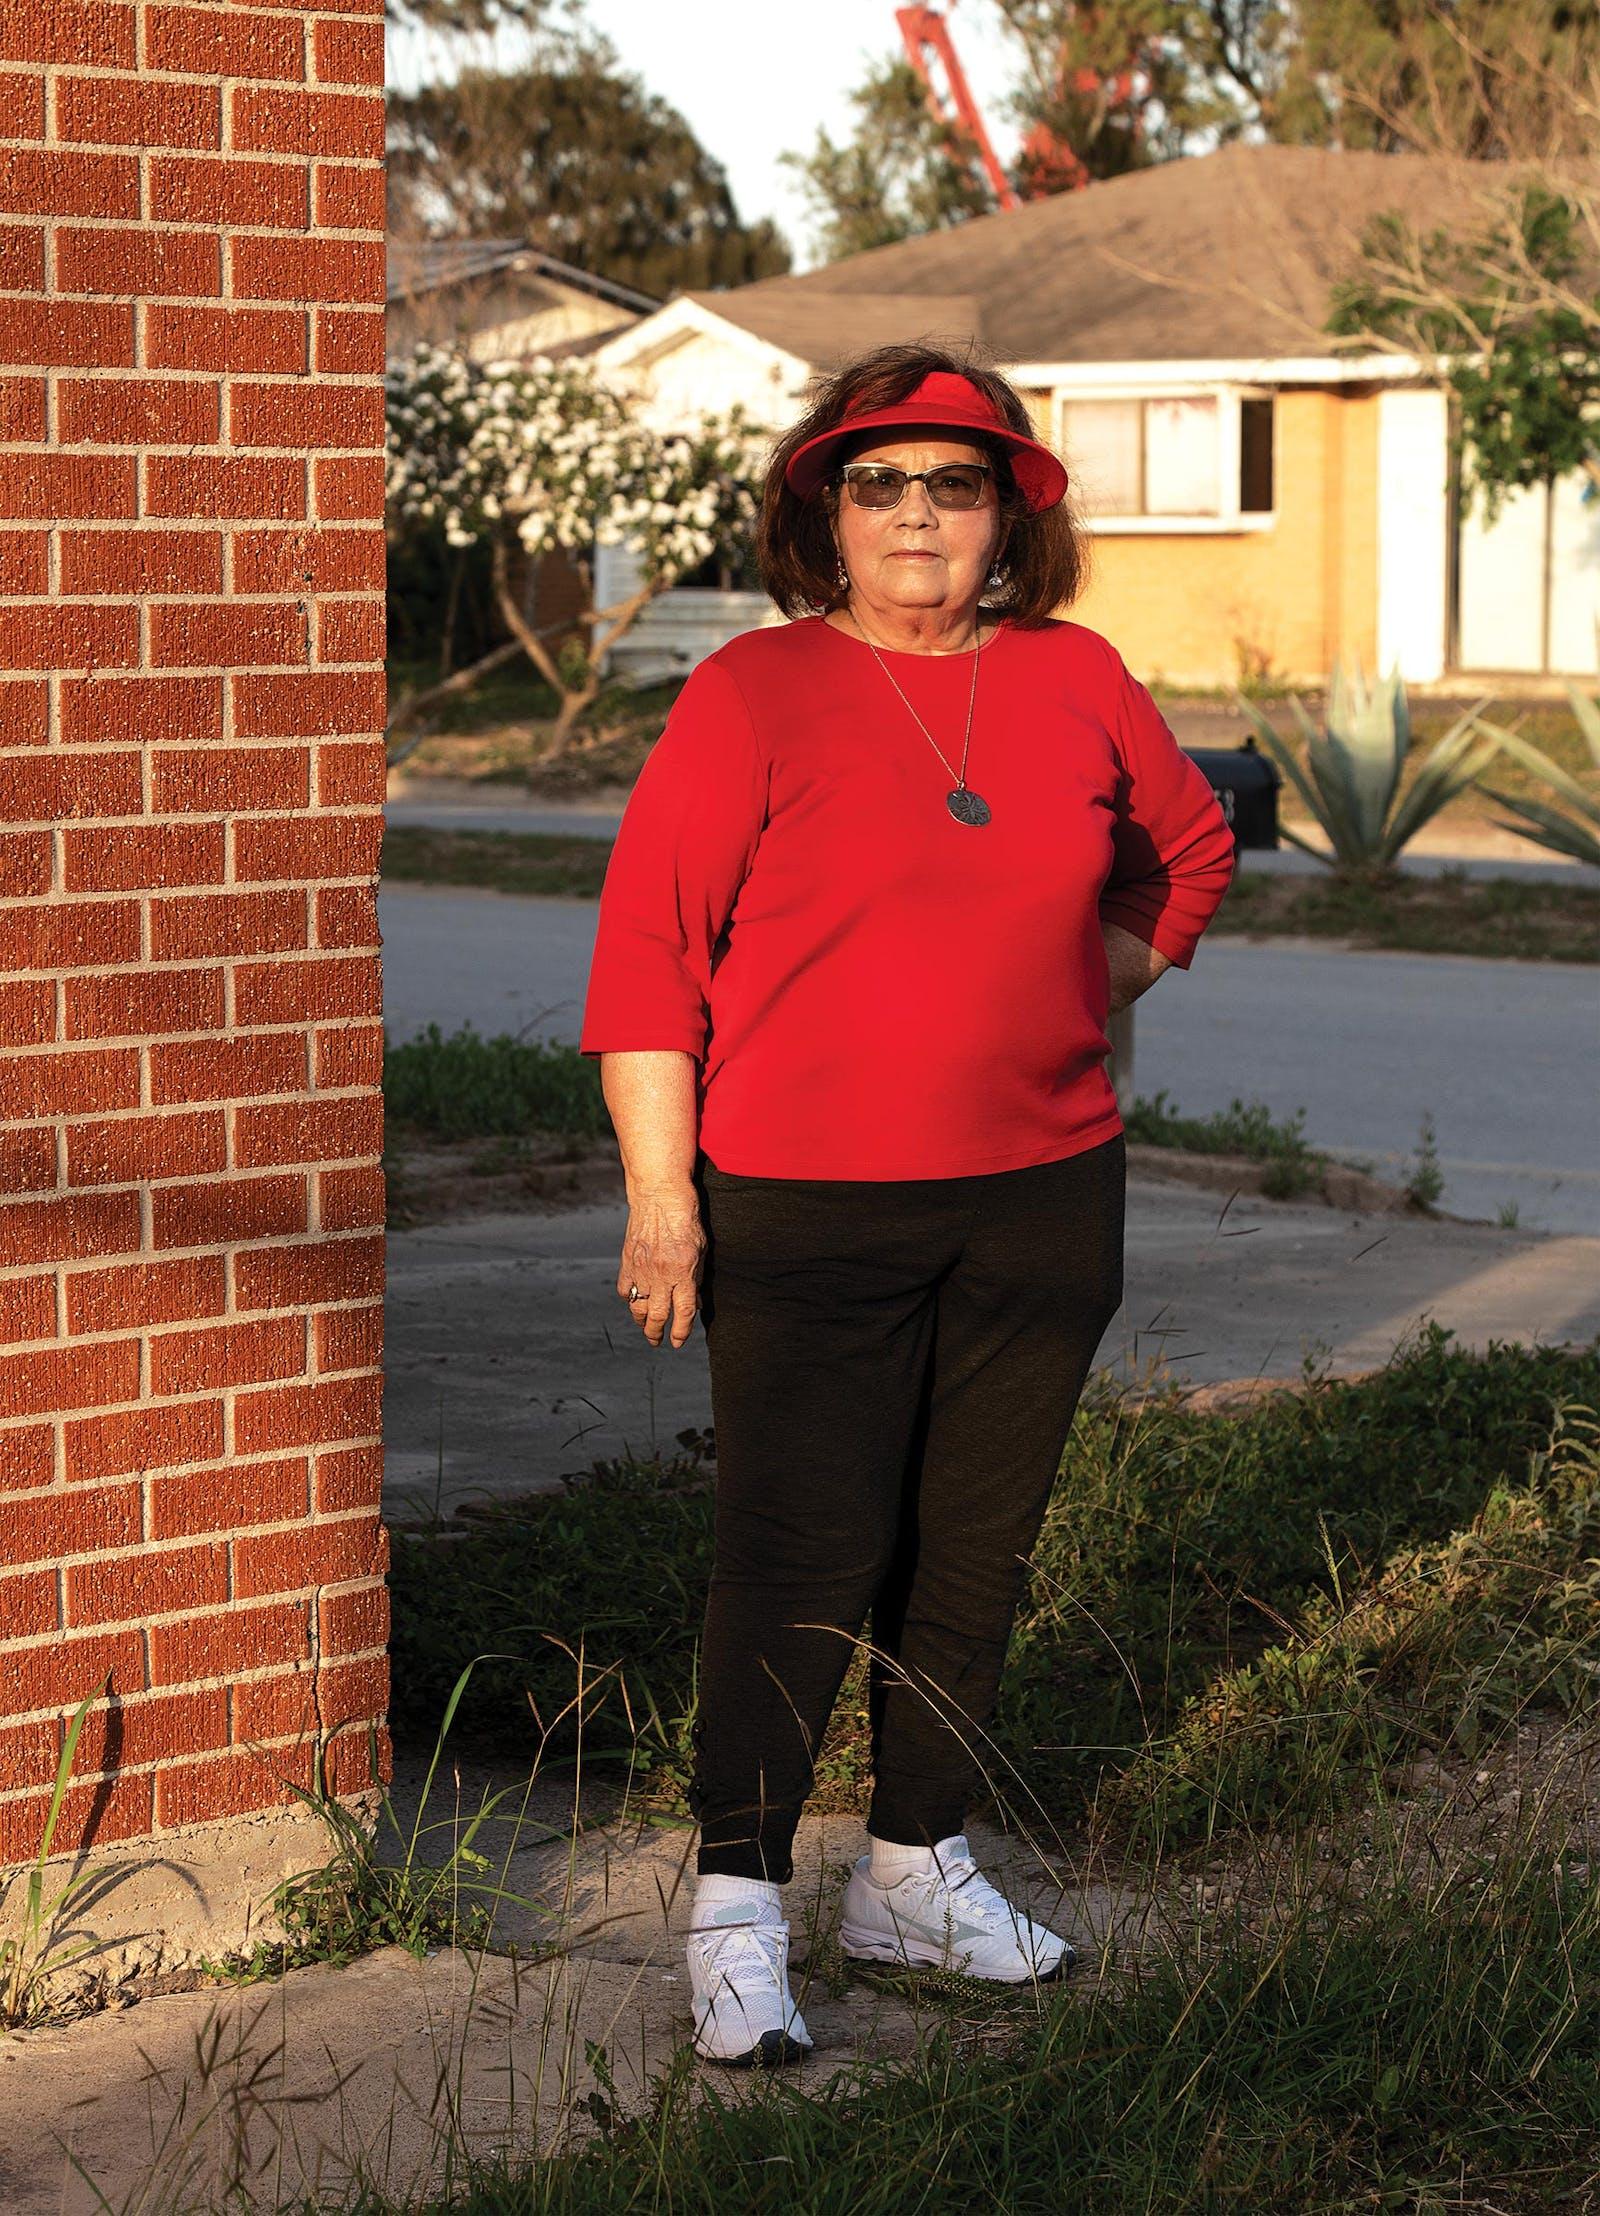 Celia Garcia outside her home in Boca Chica.